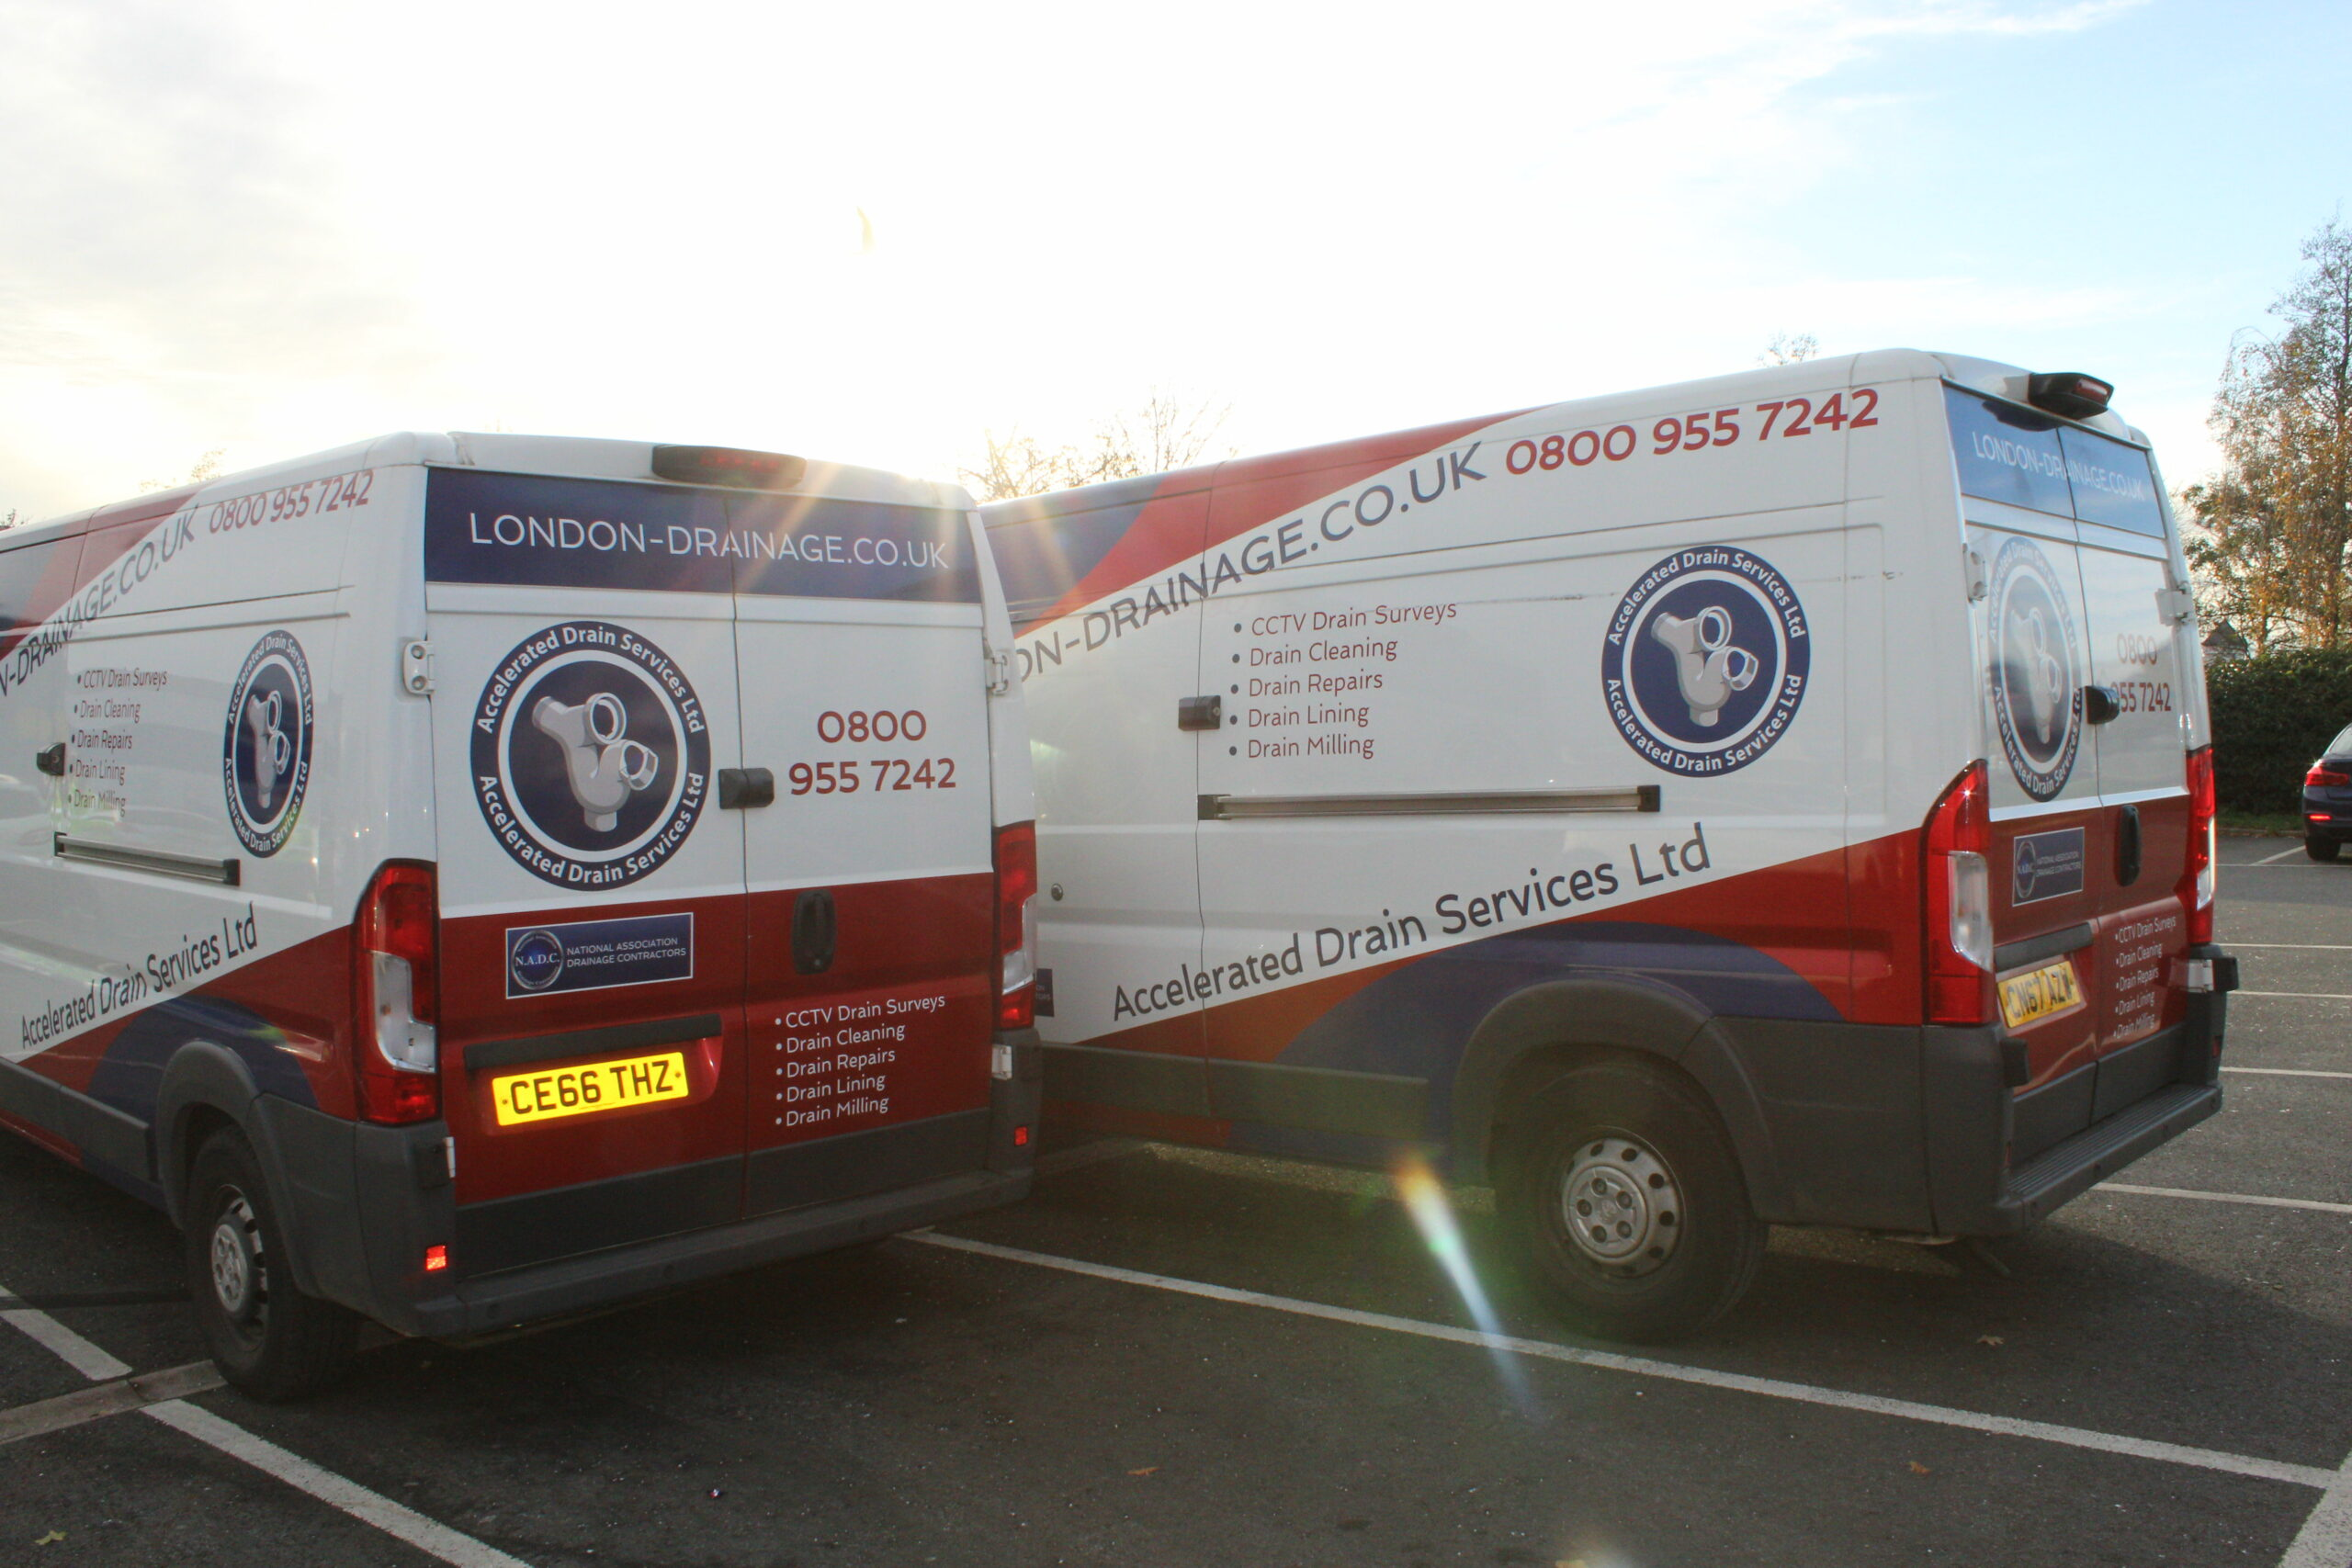 Accelerated Drain Services Van Branding